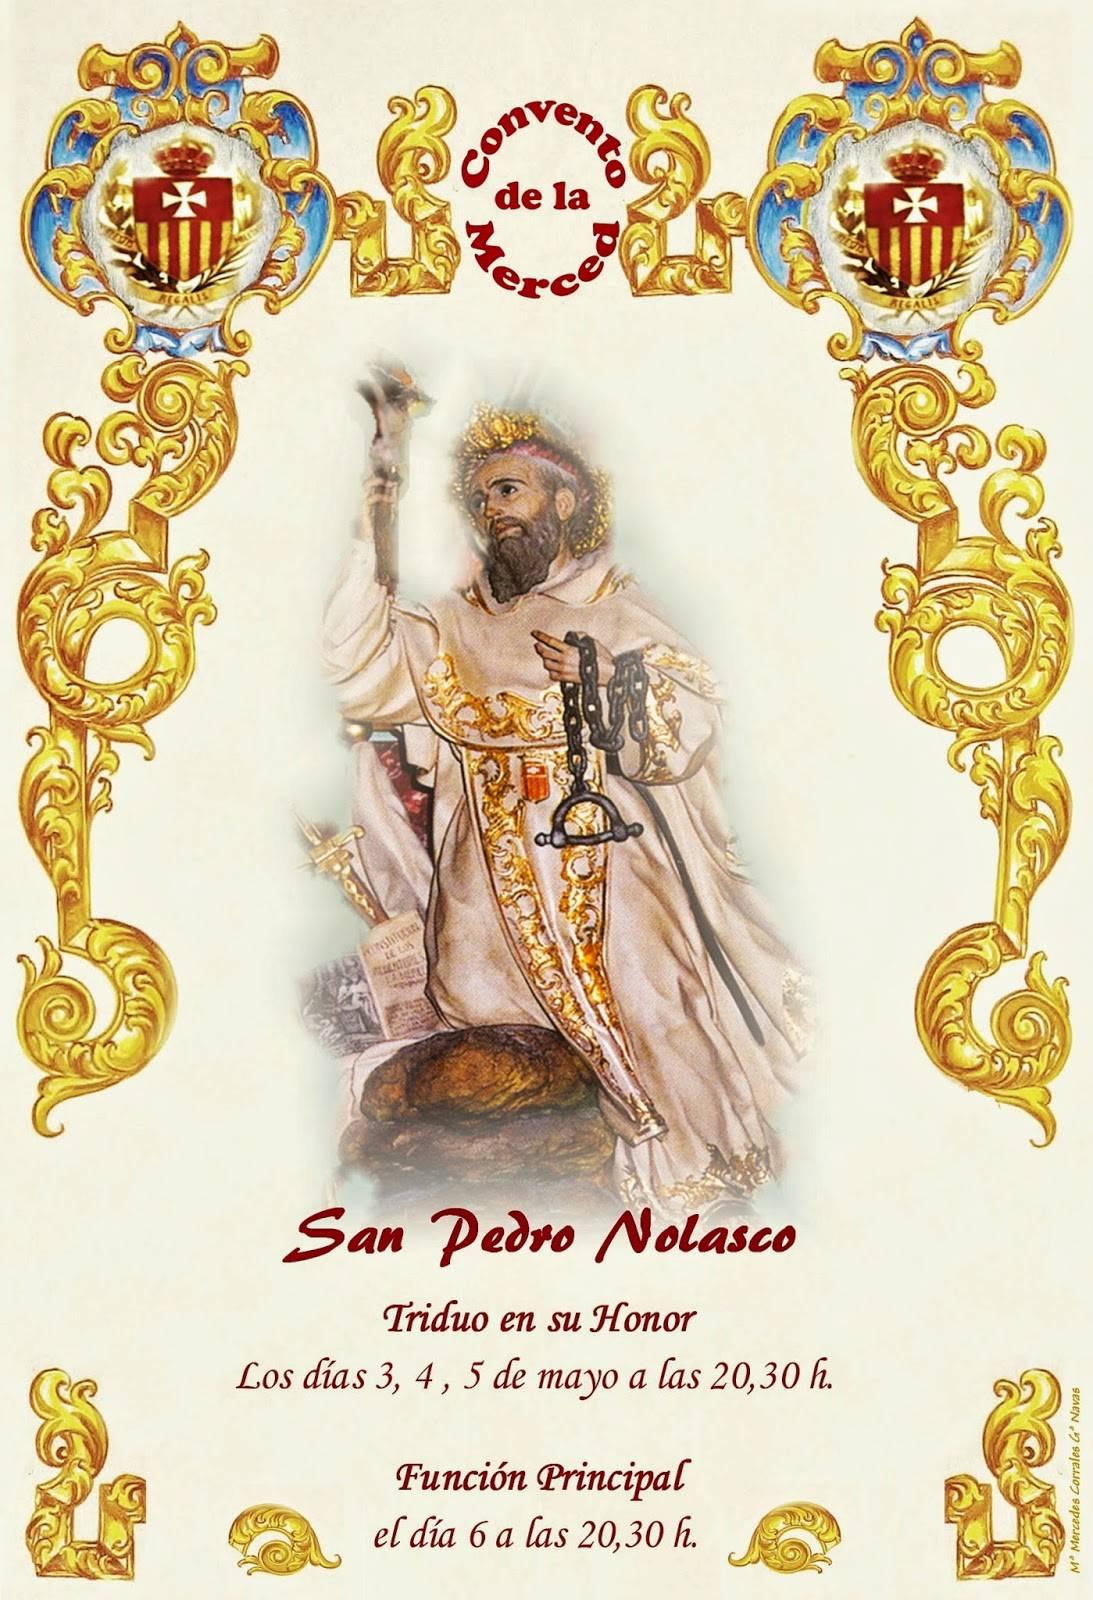 CARTEL SAN PEDRO NOLASCO 2014 - Visita canónica del General de la Orden de la Merced y Triduo a san Pedro Nolasco